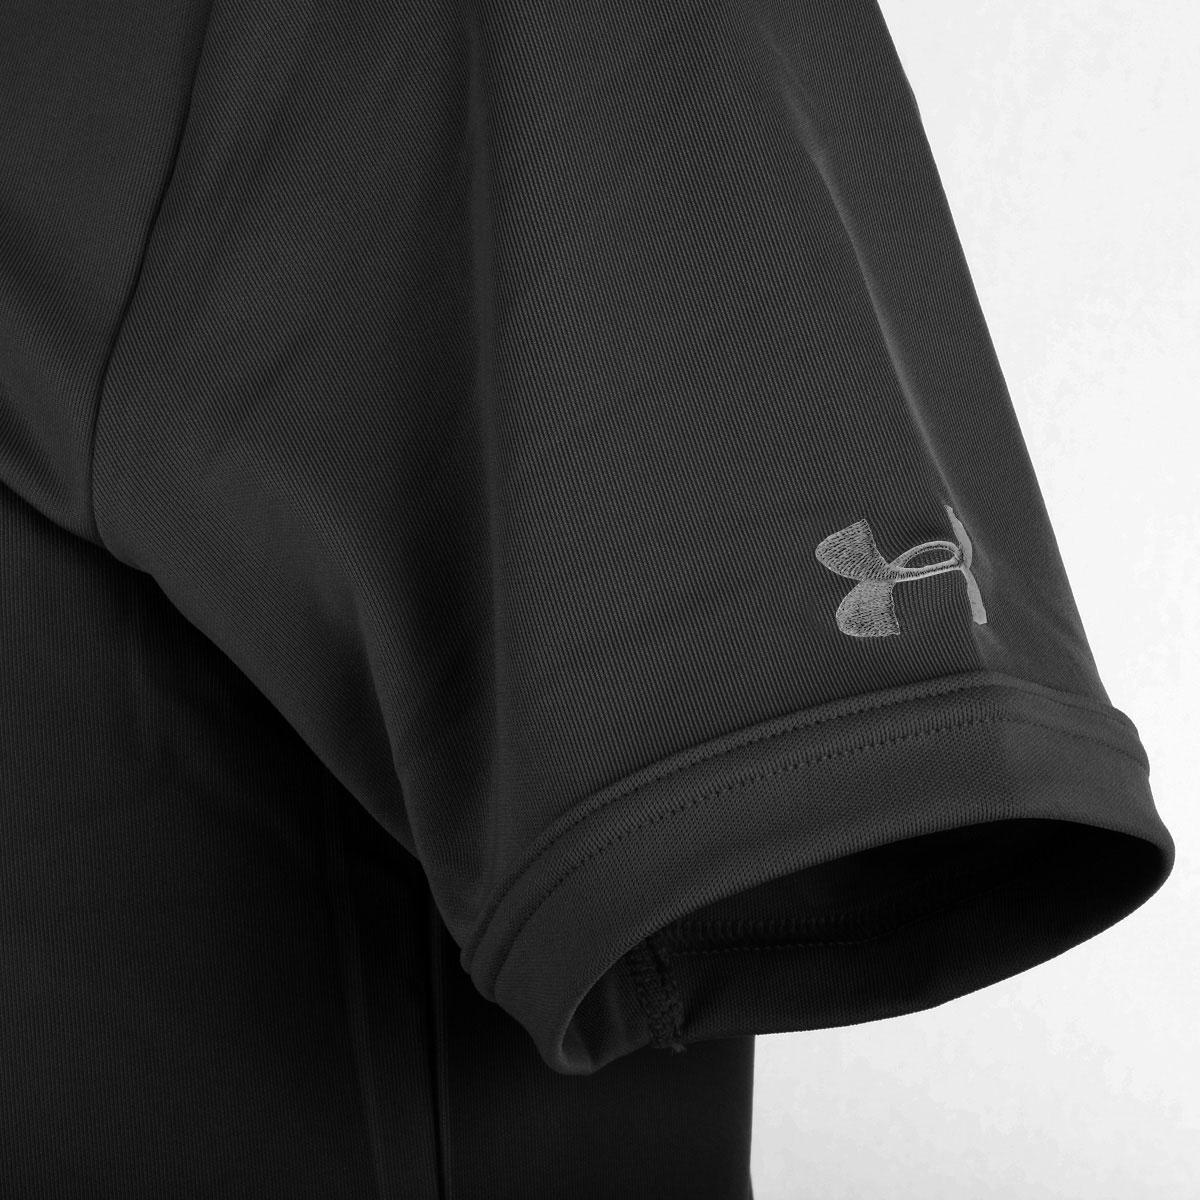 Under-Armour-Mens-Medal-Play-Performance-Polo-Shirt-UA-Golf-Short-Sleeve thumbnail 12